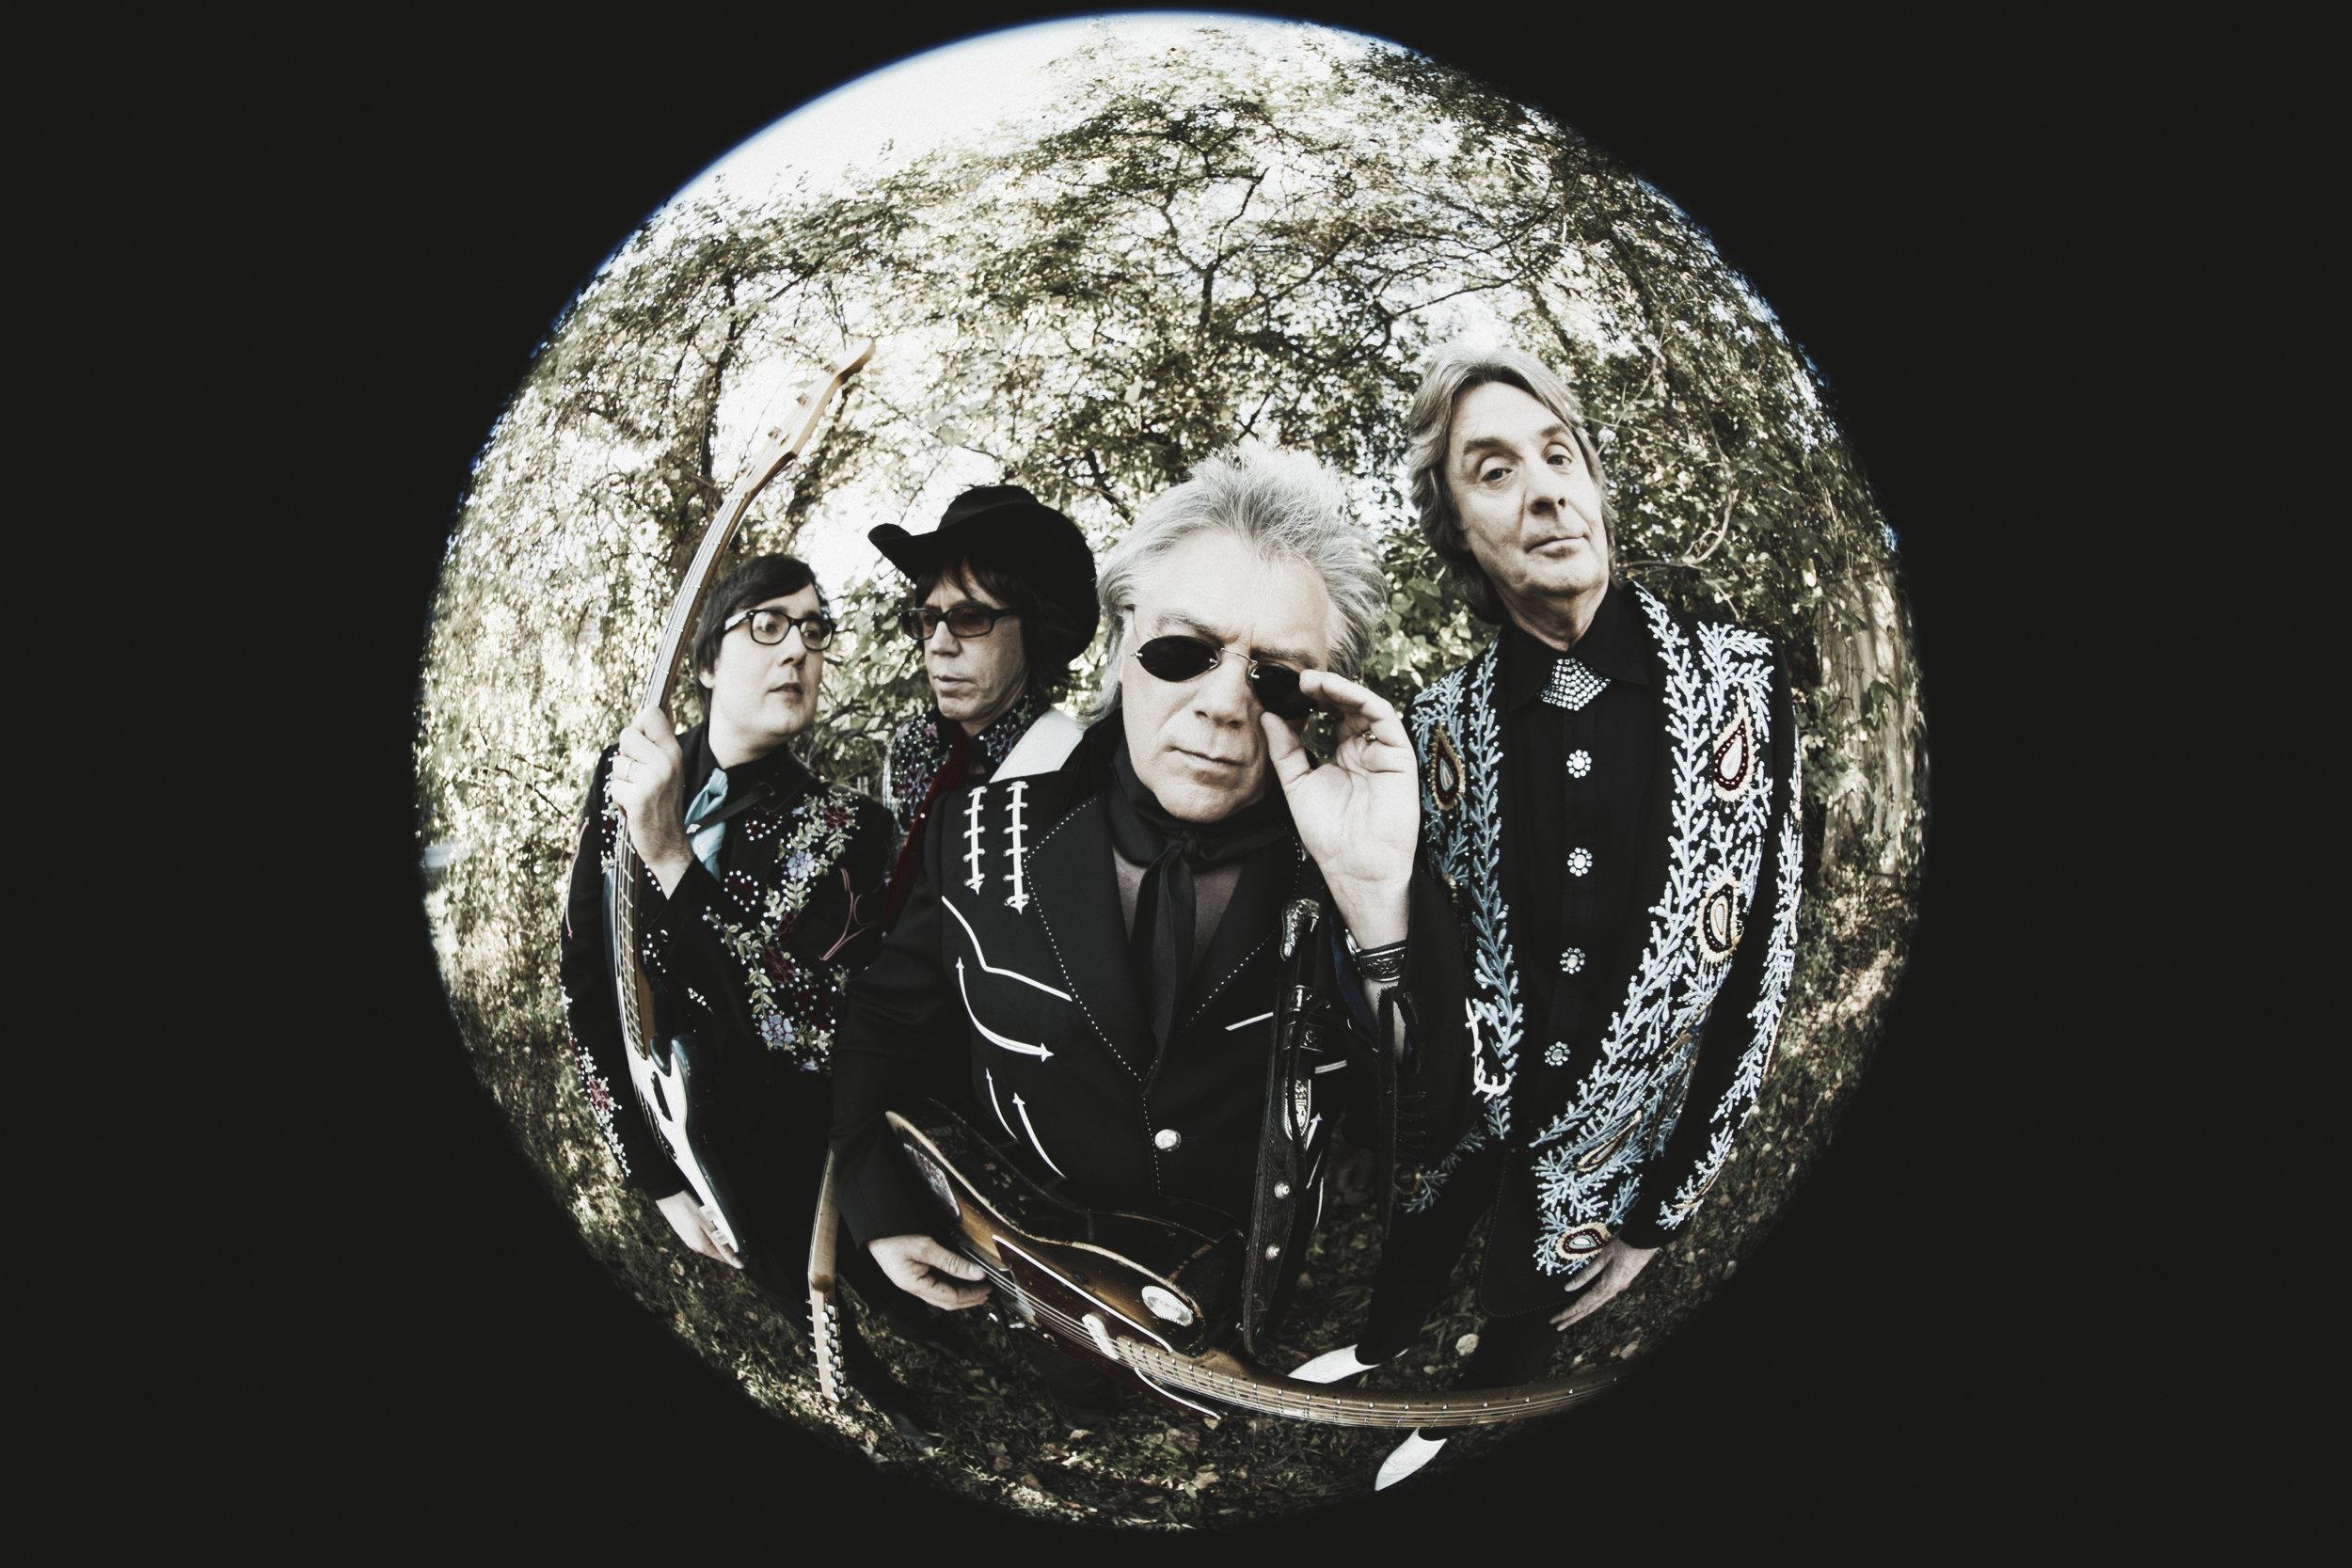 Marty Stuart and band